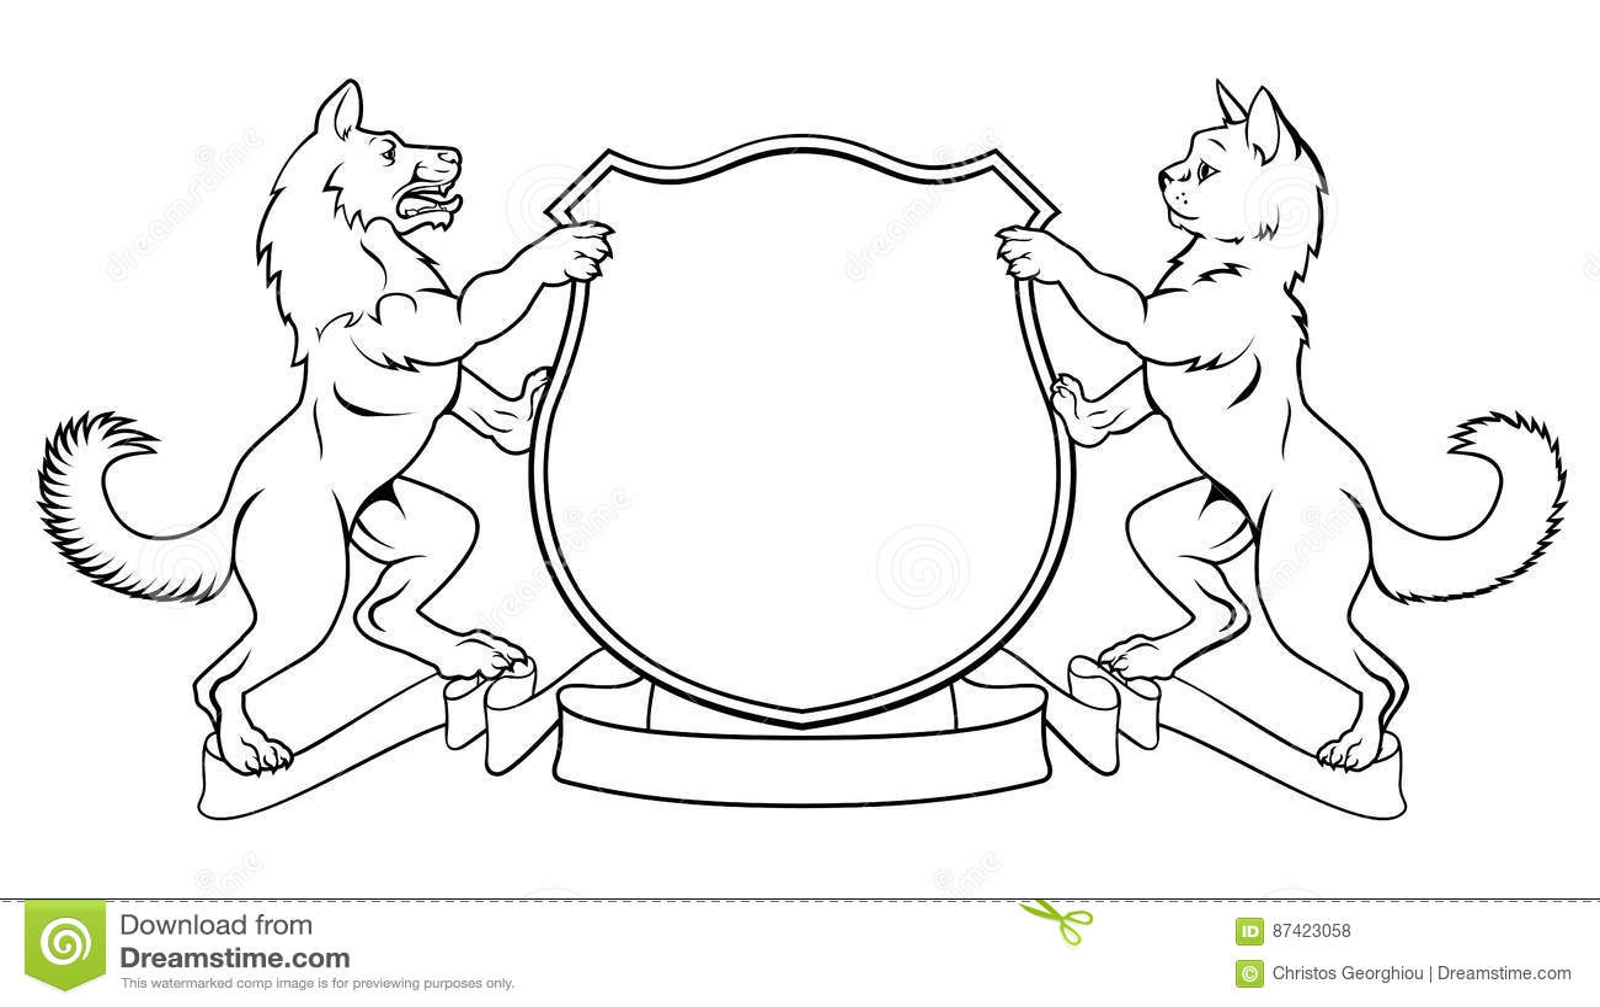 jai hind logo symbol stock photo